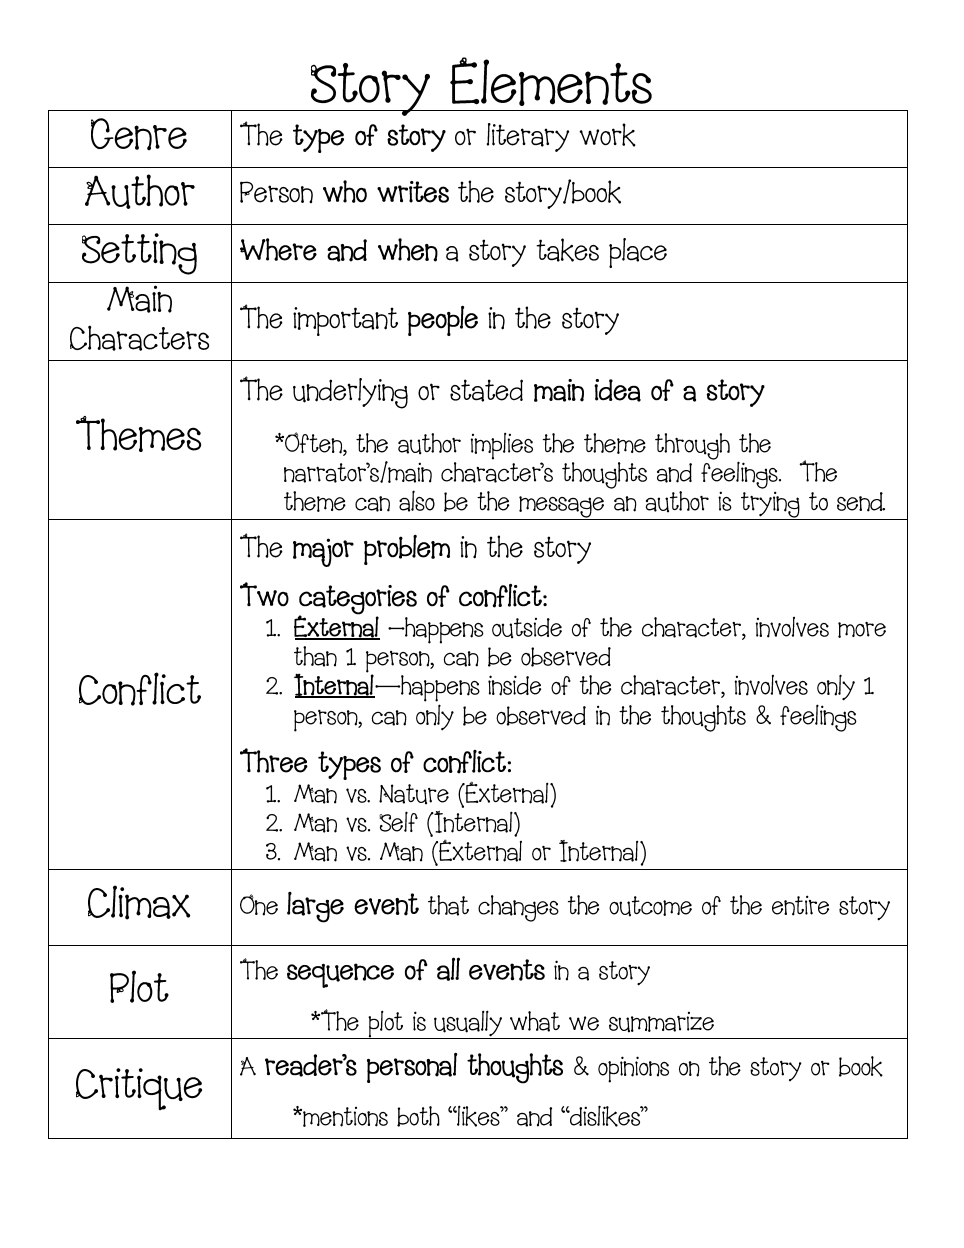 medium resolution of 29 Elements Of A Short Story Worksheet - Worksheet Resource Plans